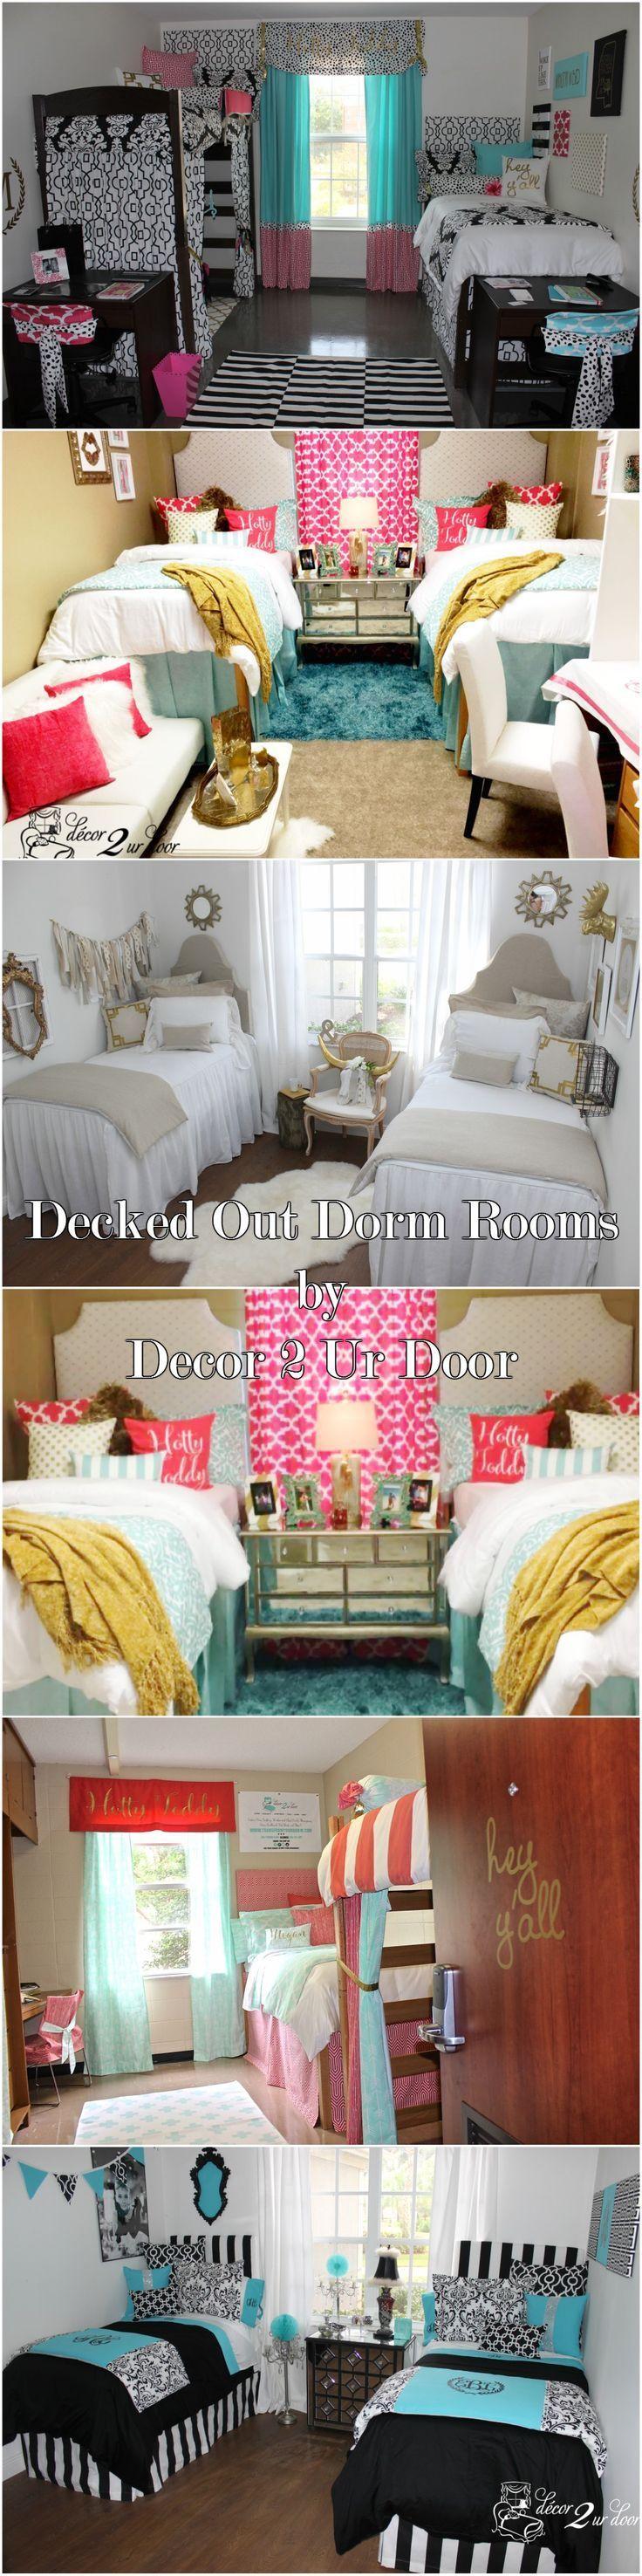 Decorating A Dorm Room Check Out Decor 2 Ur Door